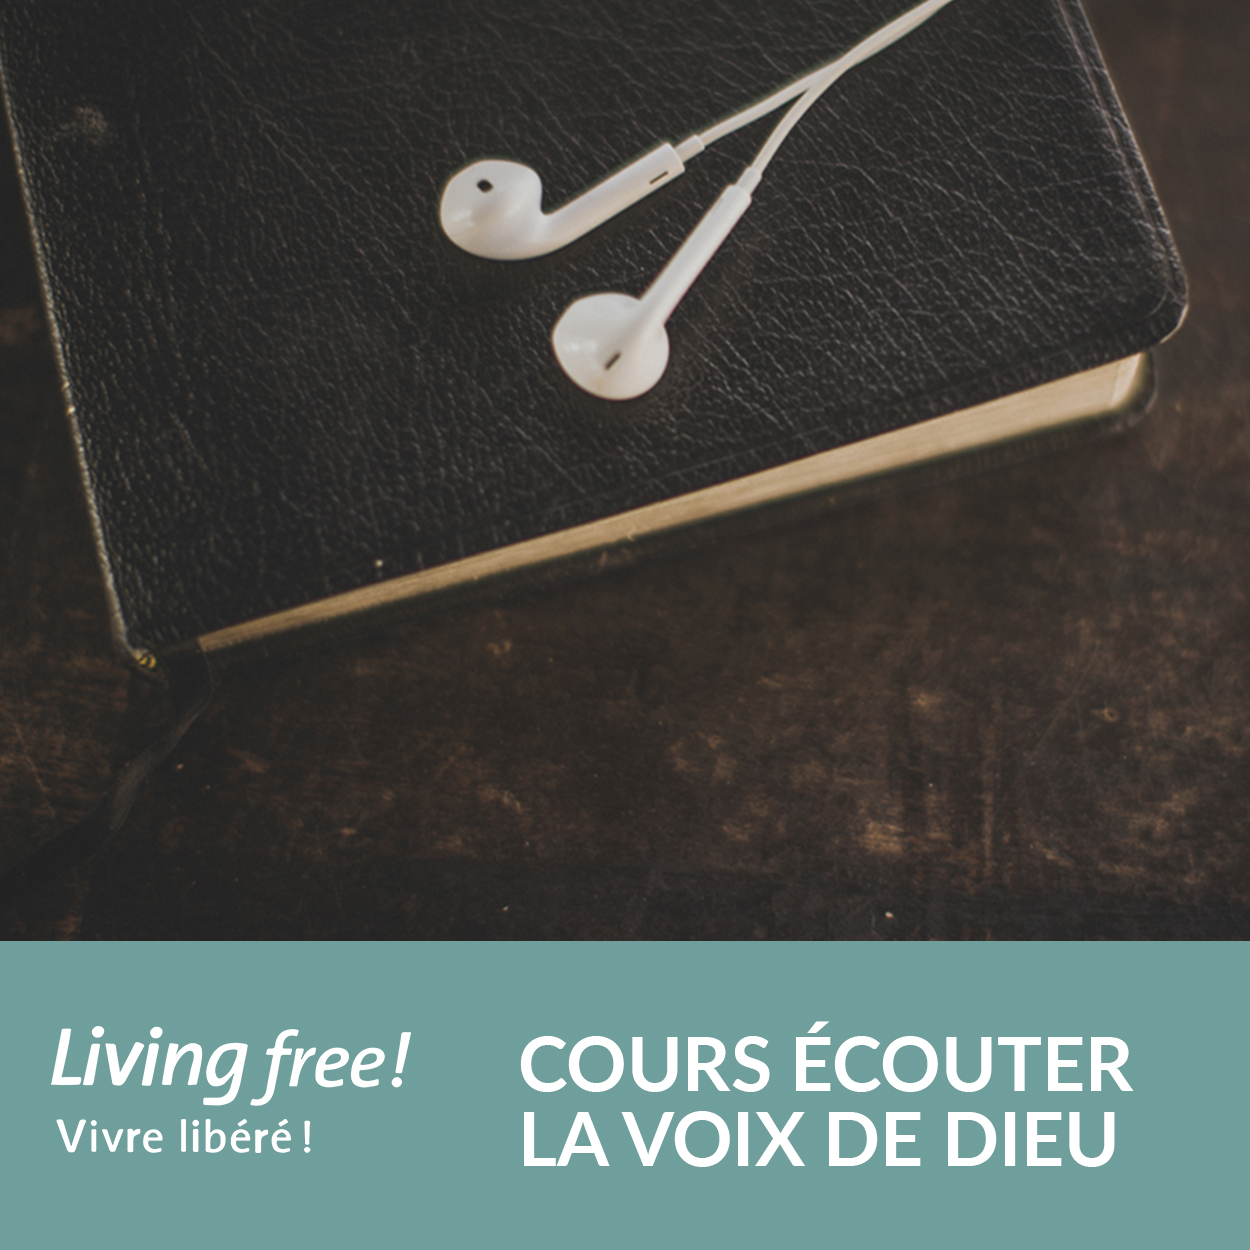 vivreLibere_ecoutervoixDieu.jpg